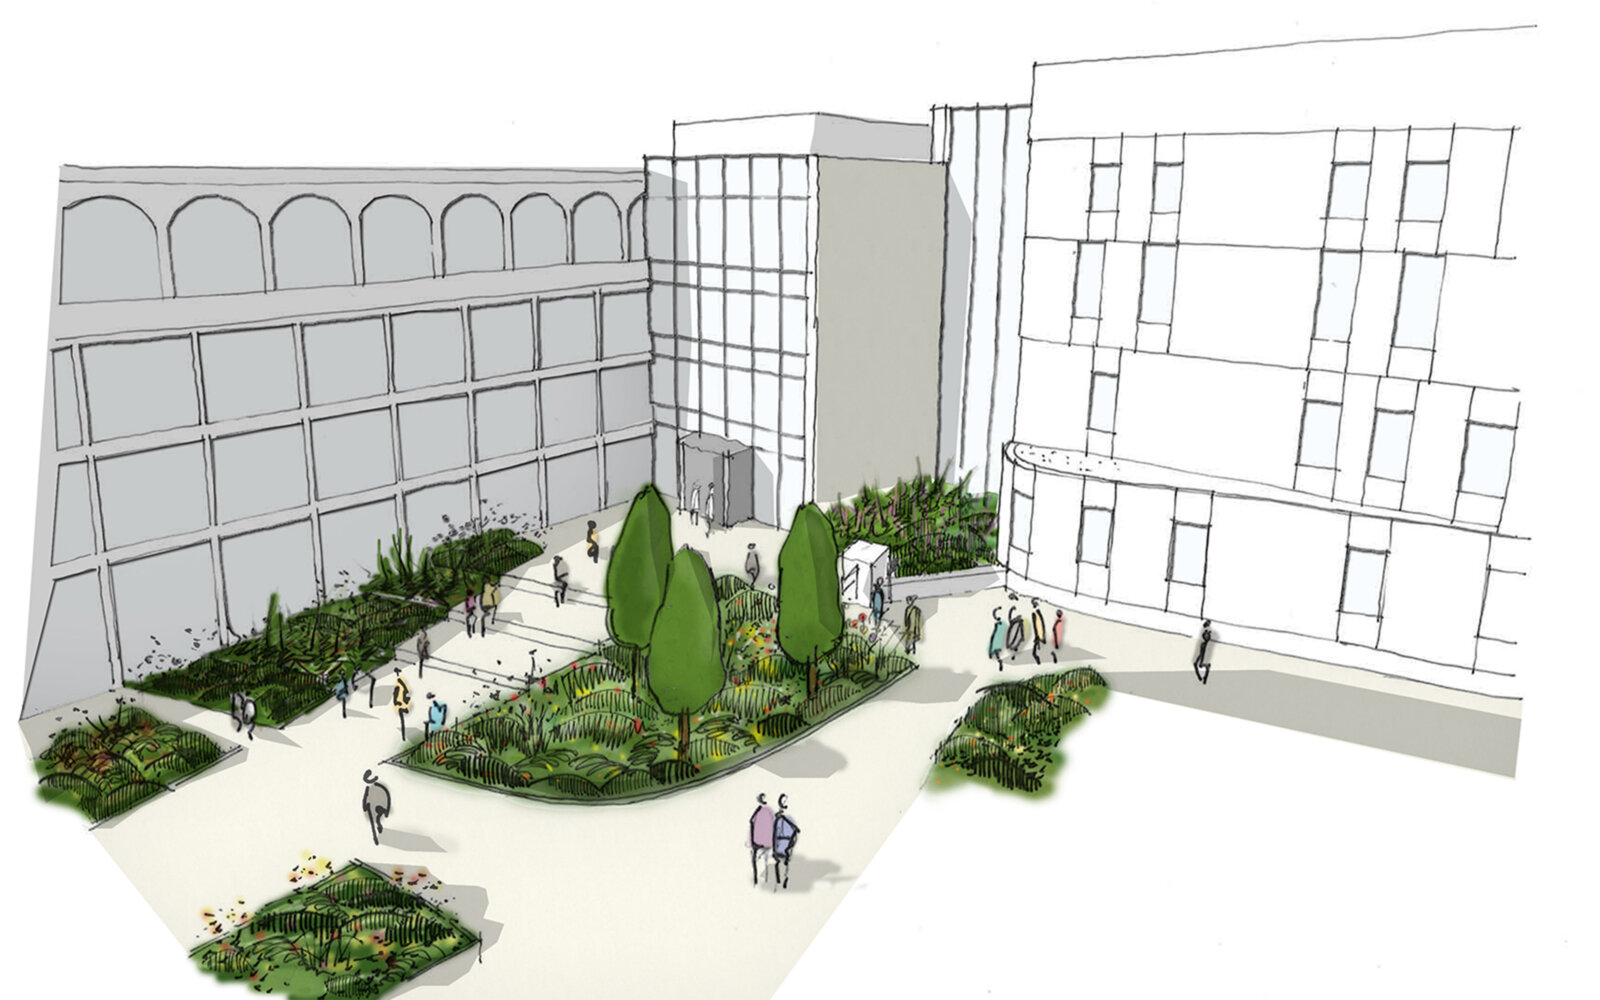 Joseph Priestley East Building University of Huddersfield sketch